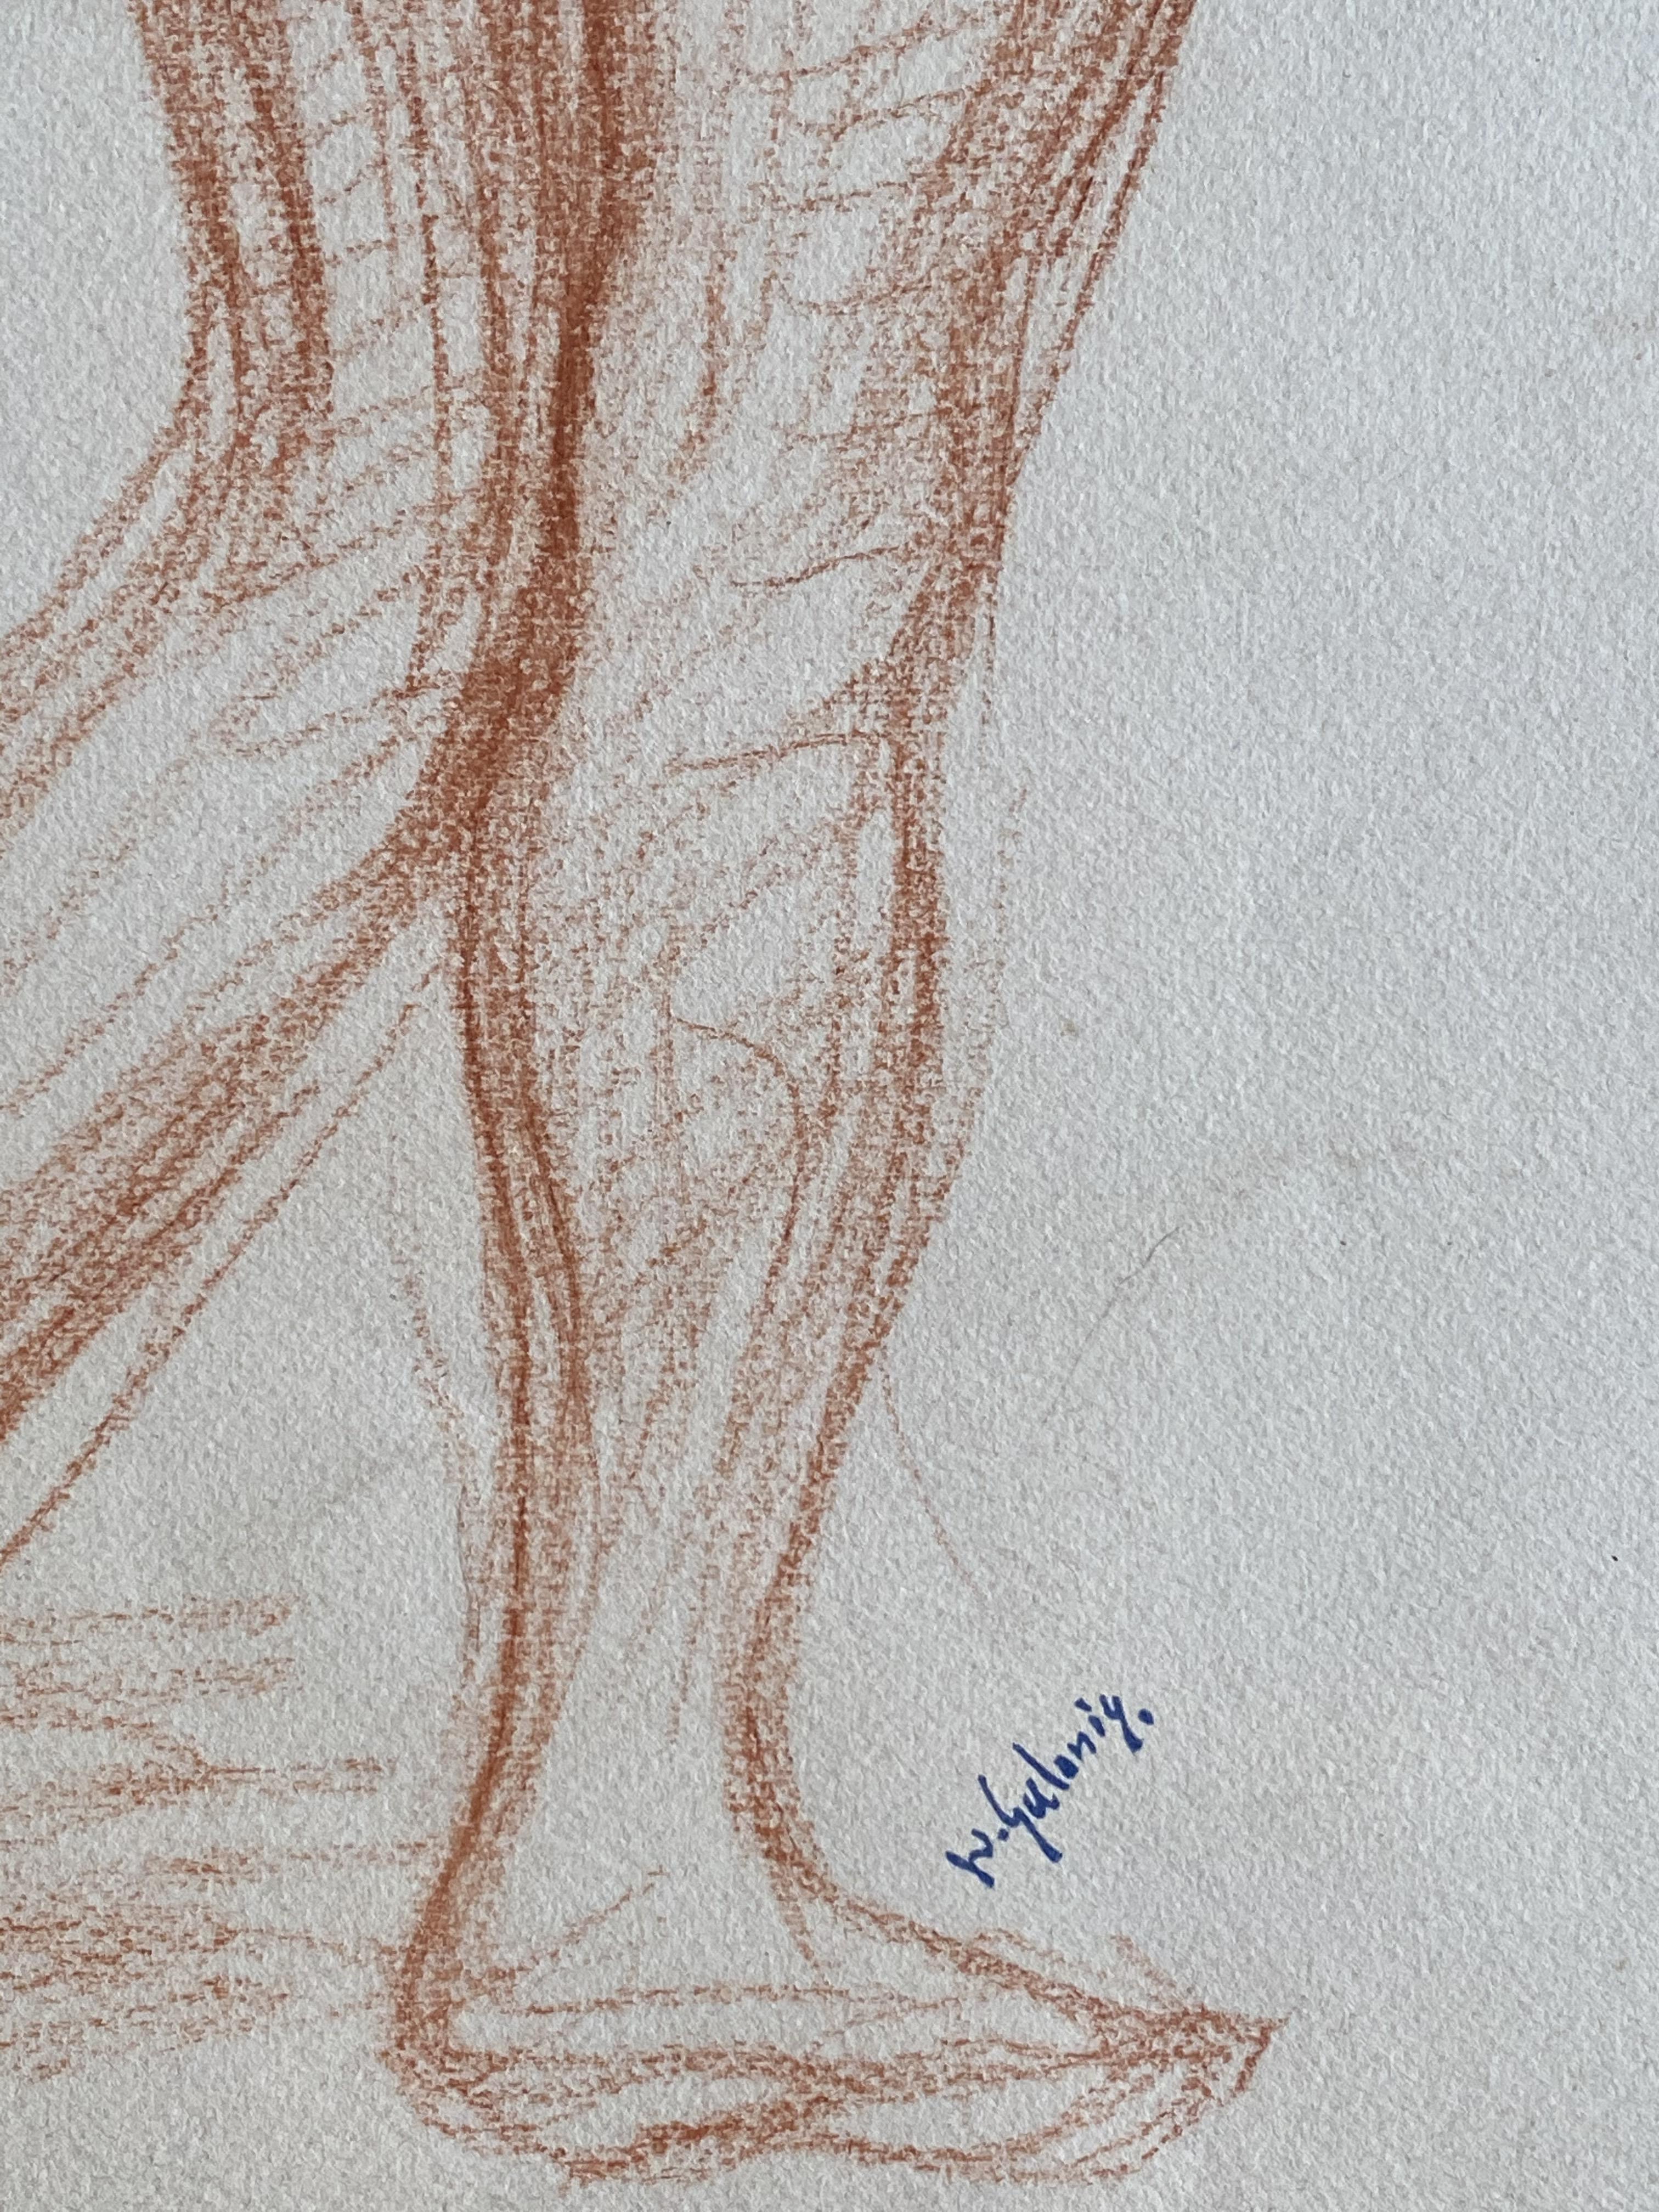 Dimitrios Galanis (Greek, 1880-1966) (AR), Two nude females, sanguine on paper, 43 x 41 cm. - Image 2 of 3